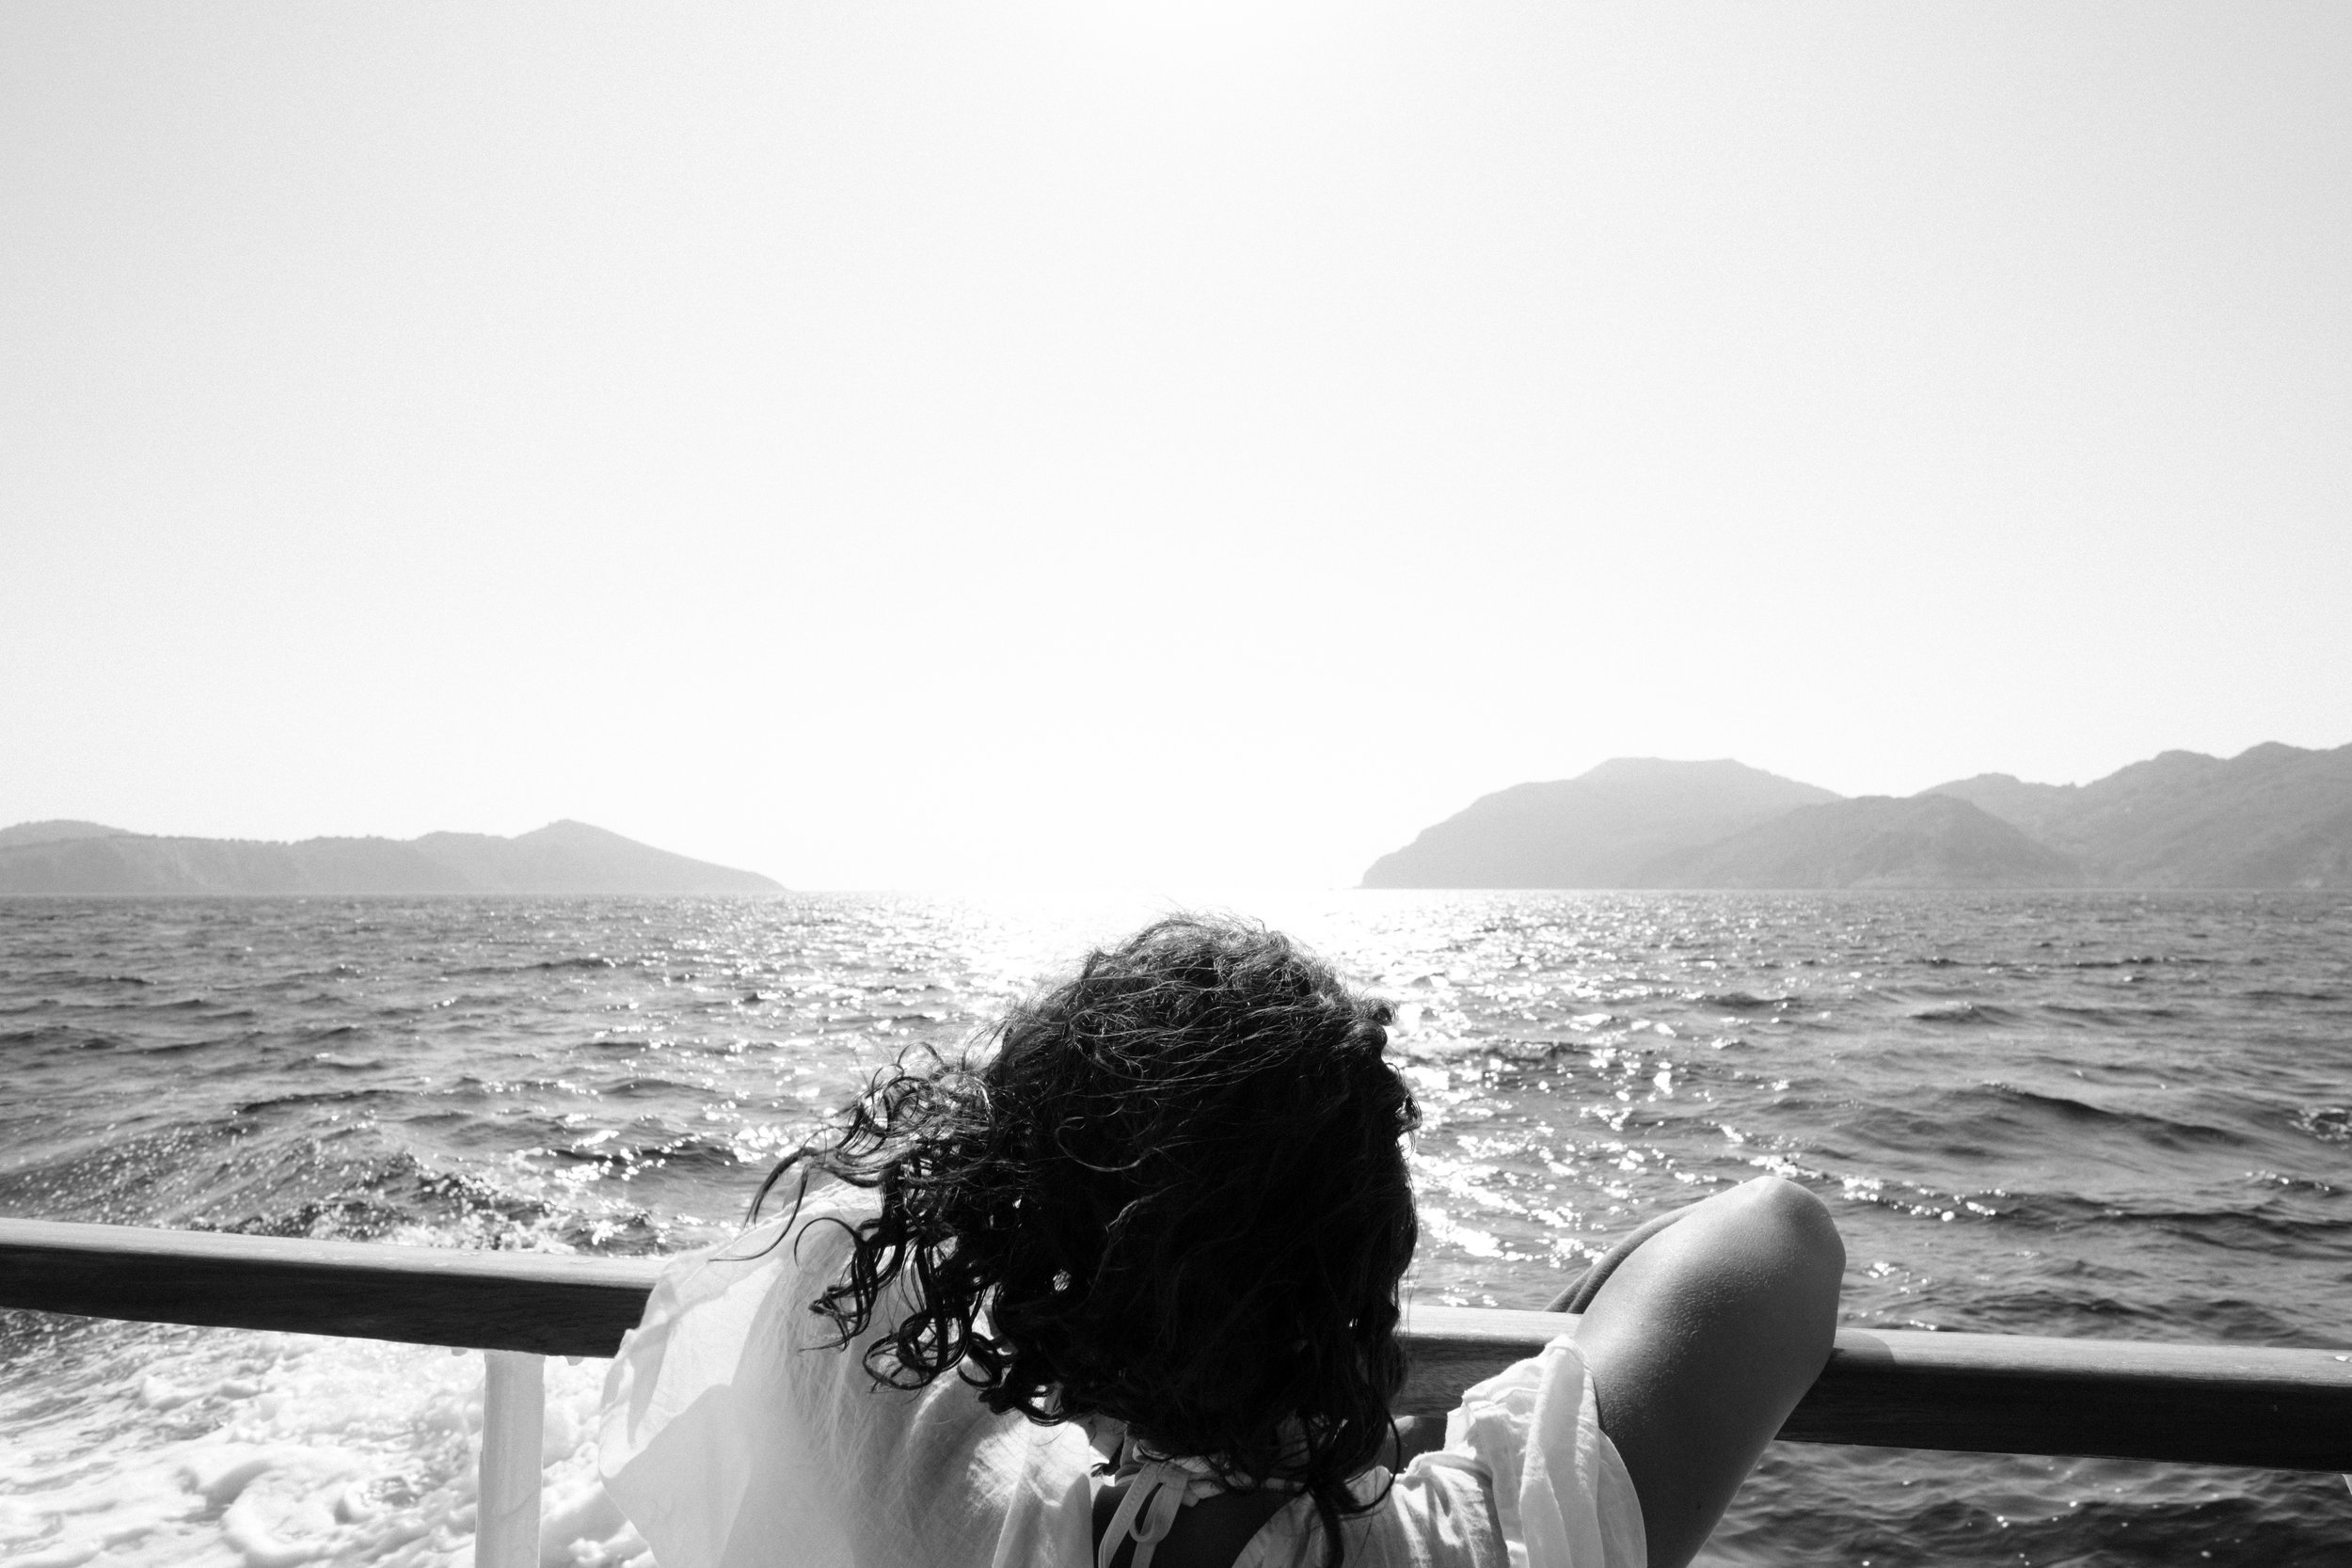 Symi , Greece, Fujifilm X-Pro2, XF 14mm f/2.8 R @ f/8